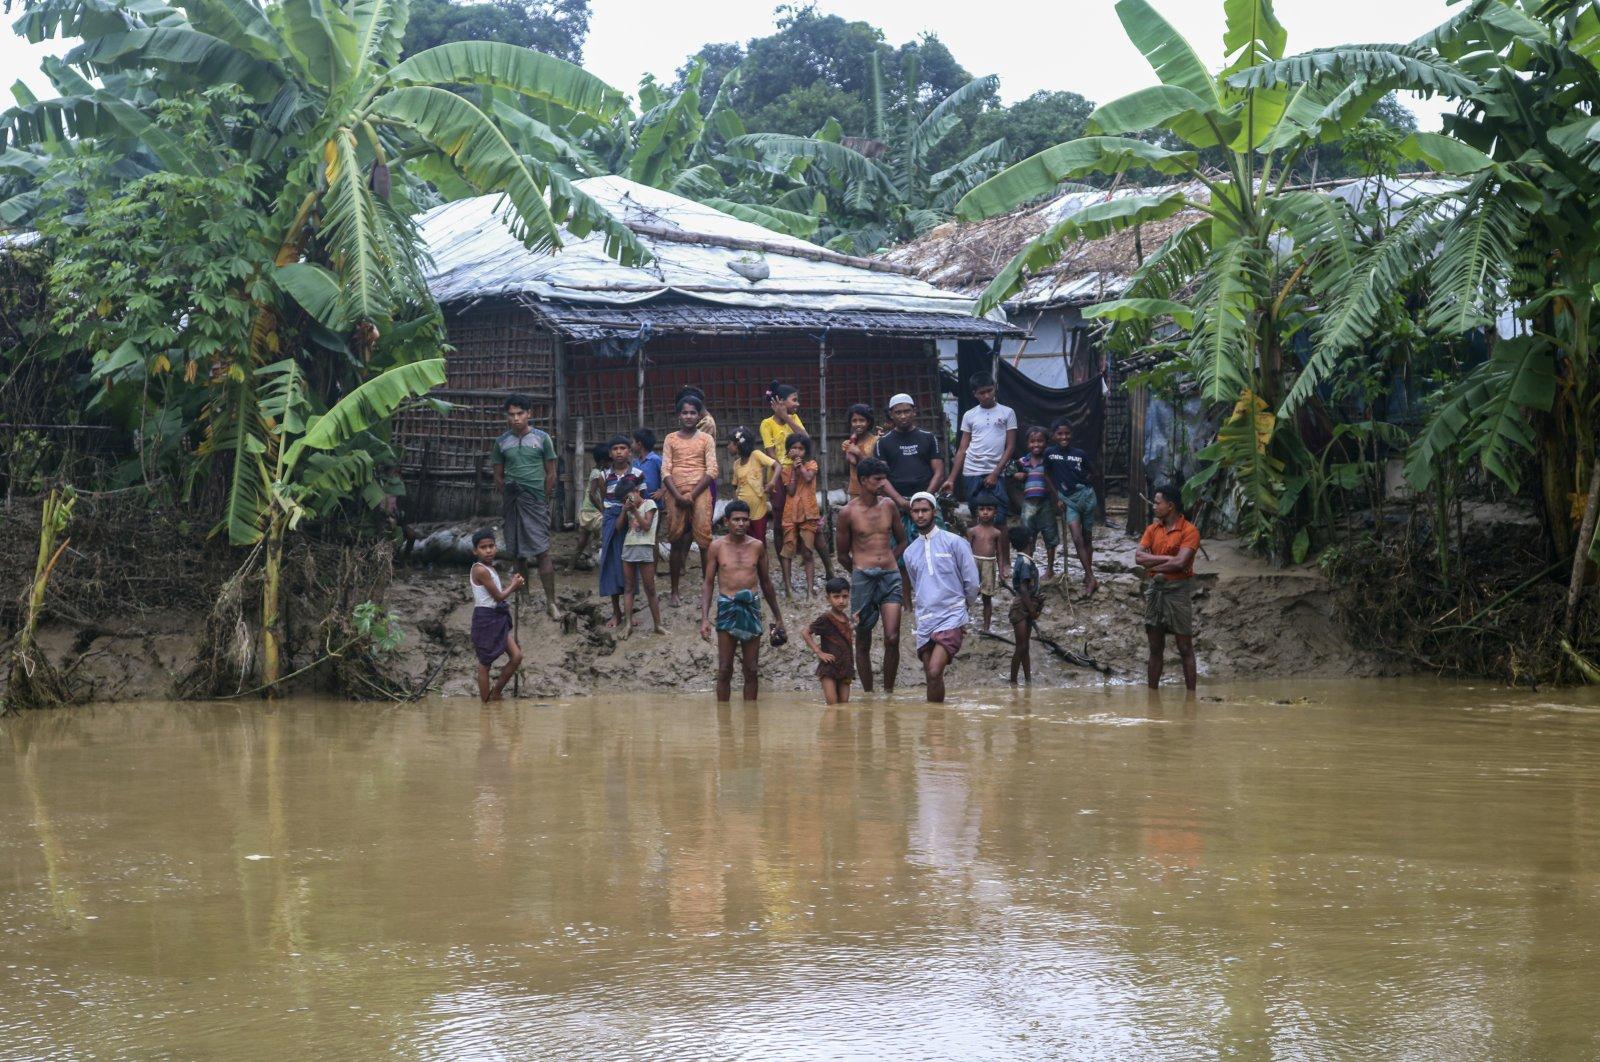 Rohingya refugees look at floodwater following heavy rains at the Rohingya refugee camp in Kutupalong, Bangladesh, July 28, 2021. (AP Photo)